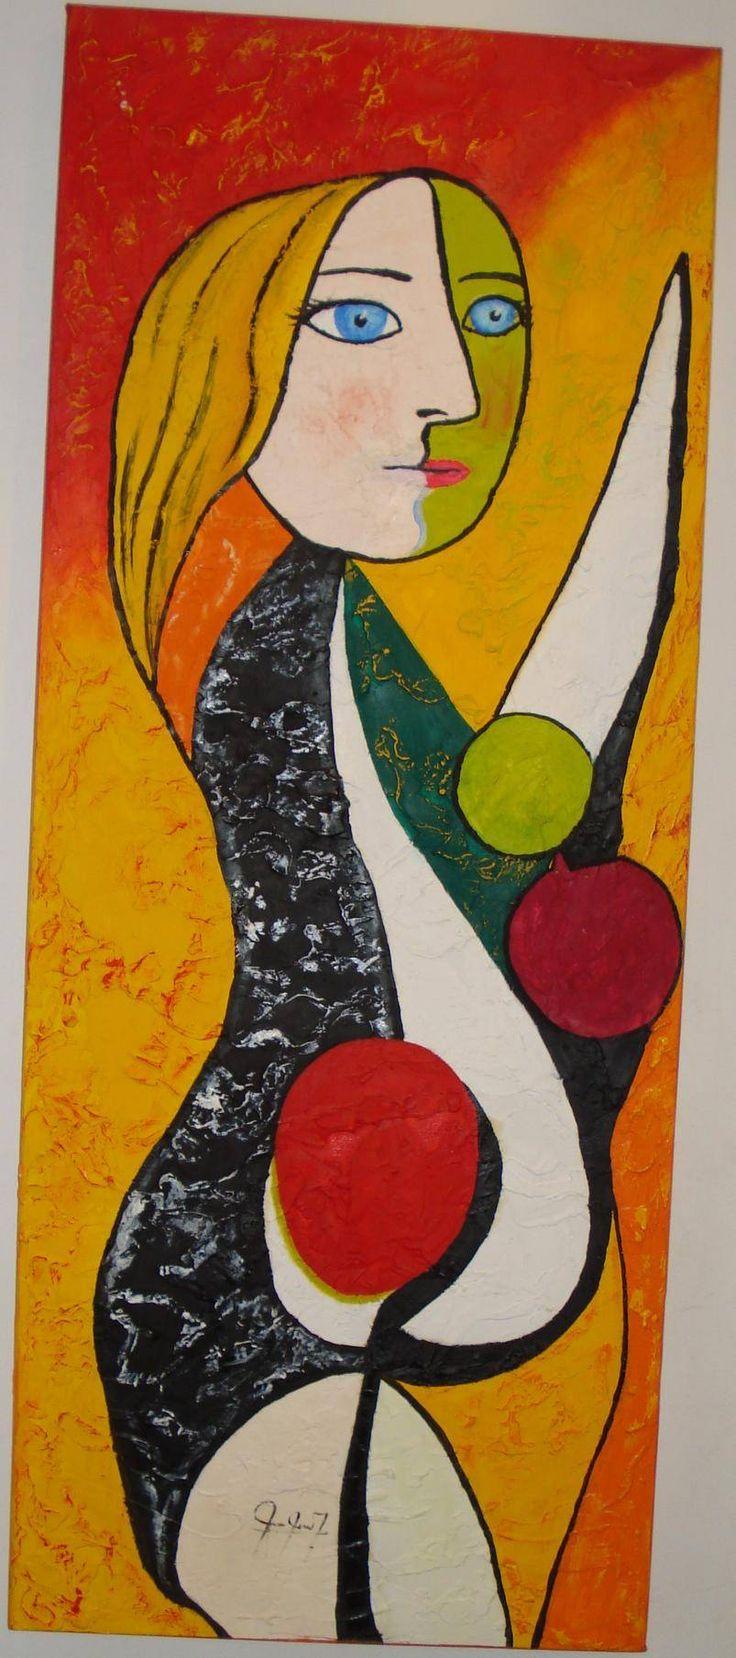 pinturas de picasso - Google Search                              …